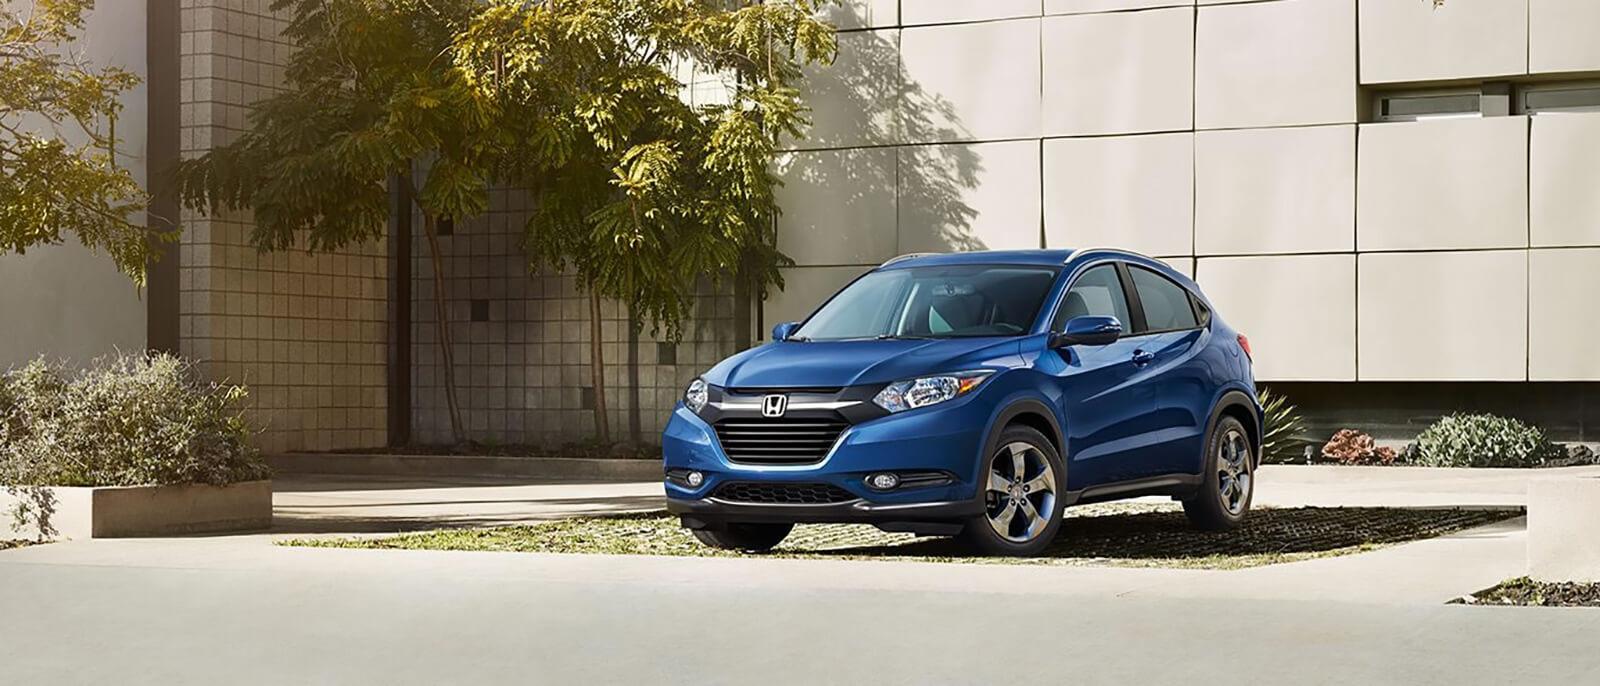 2017 Honda HR-V Blue